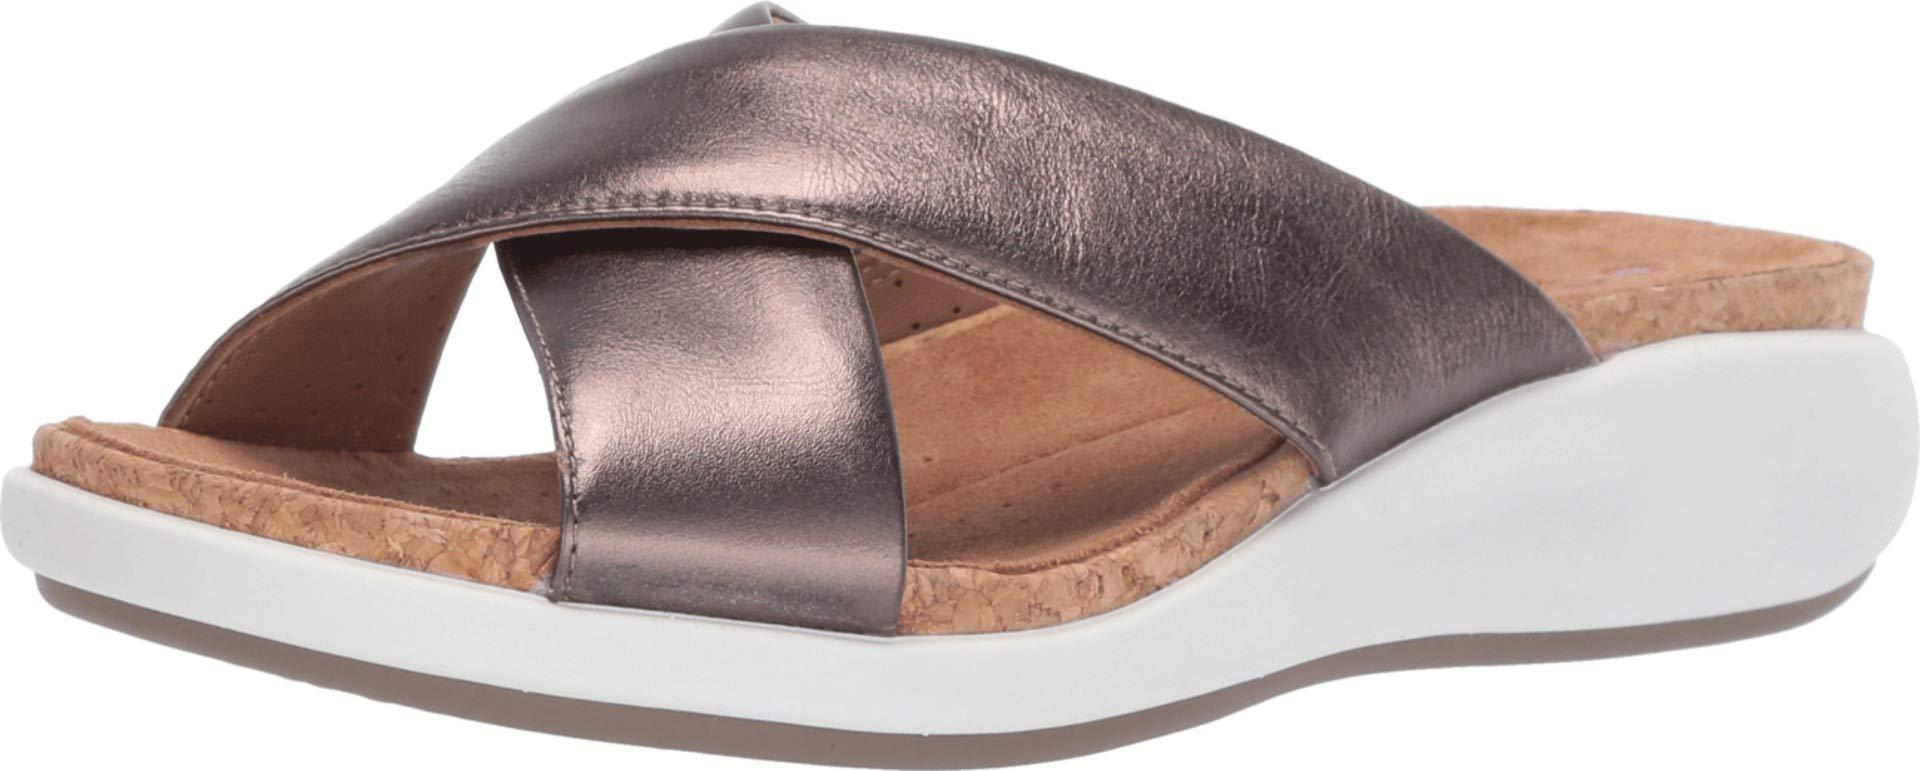 CLARKS Women's Un Bali Go Slide Sandal, Pebble Metallic Leather, 12 M US by CLARKS